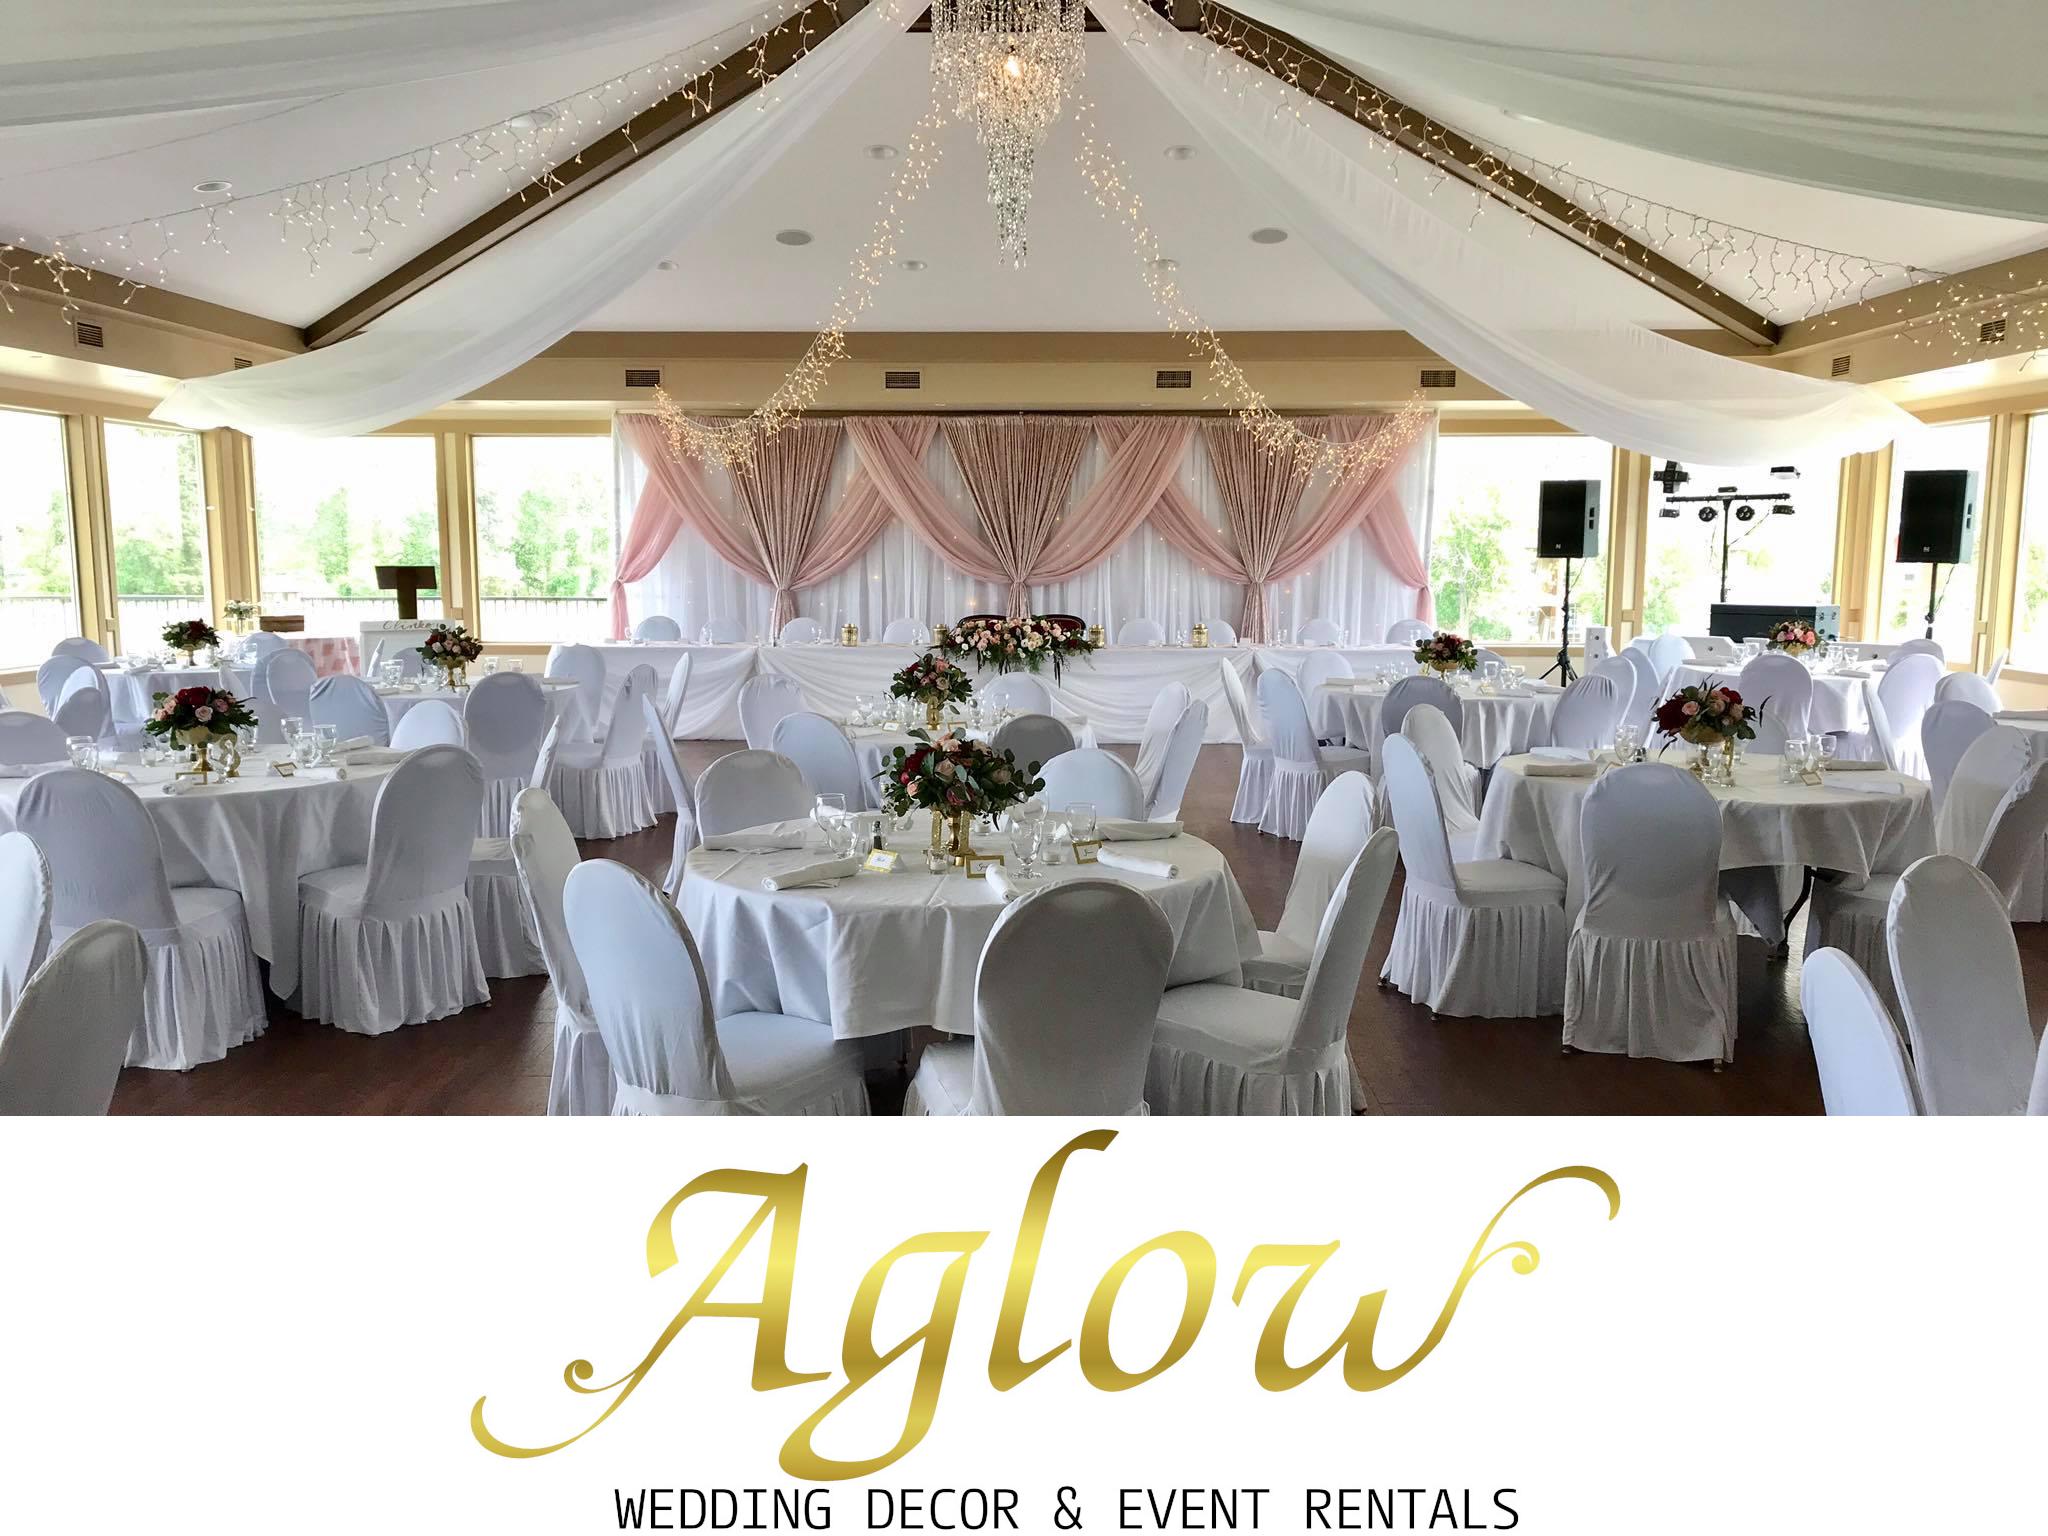 Wedding Decor Rental Company Christmas Aglow Bridal Lounge Wedding Decorations Wedding Rentals Decor Wedding Event Decor